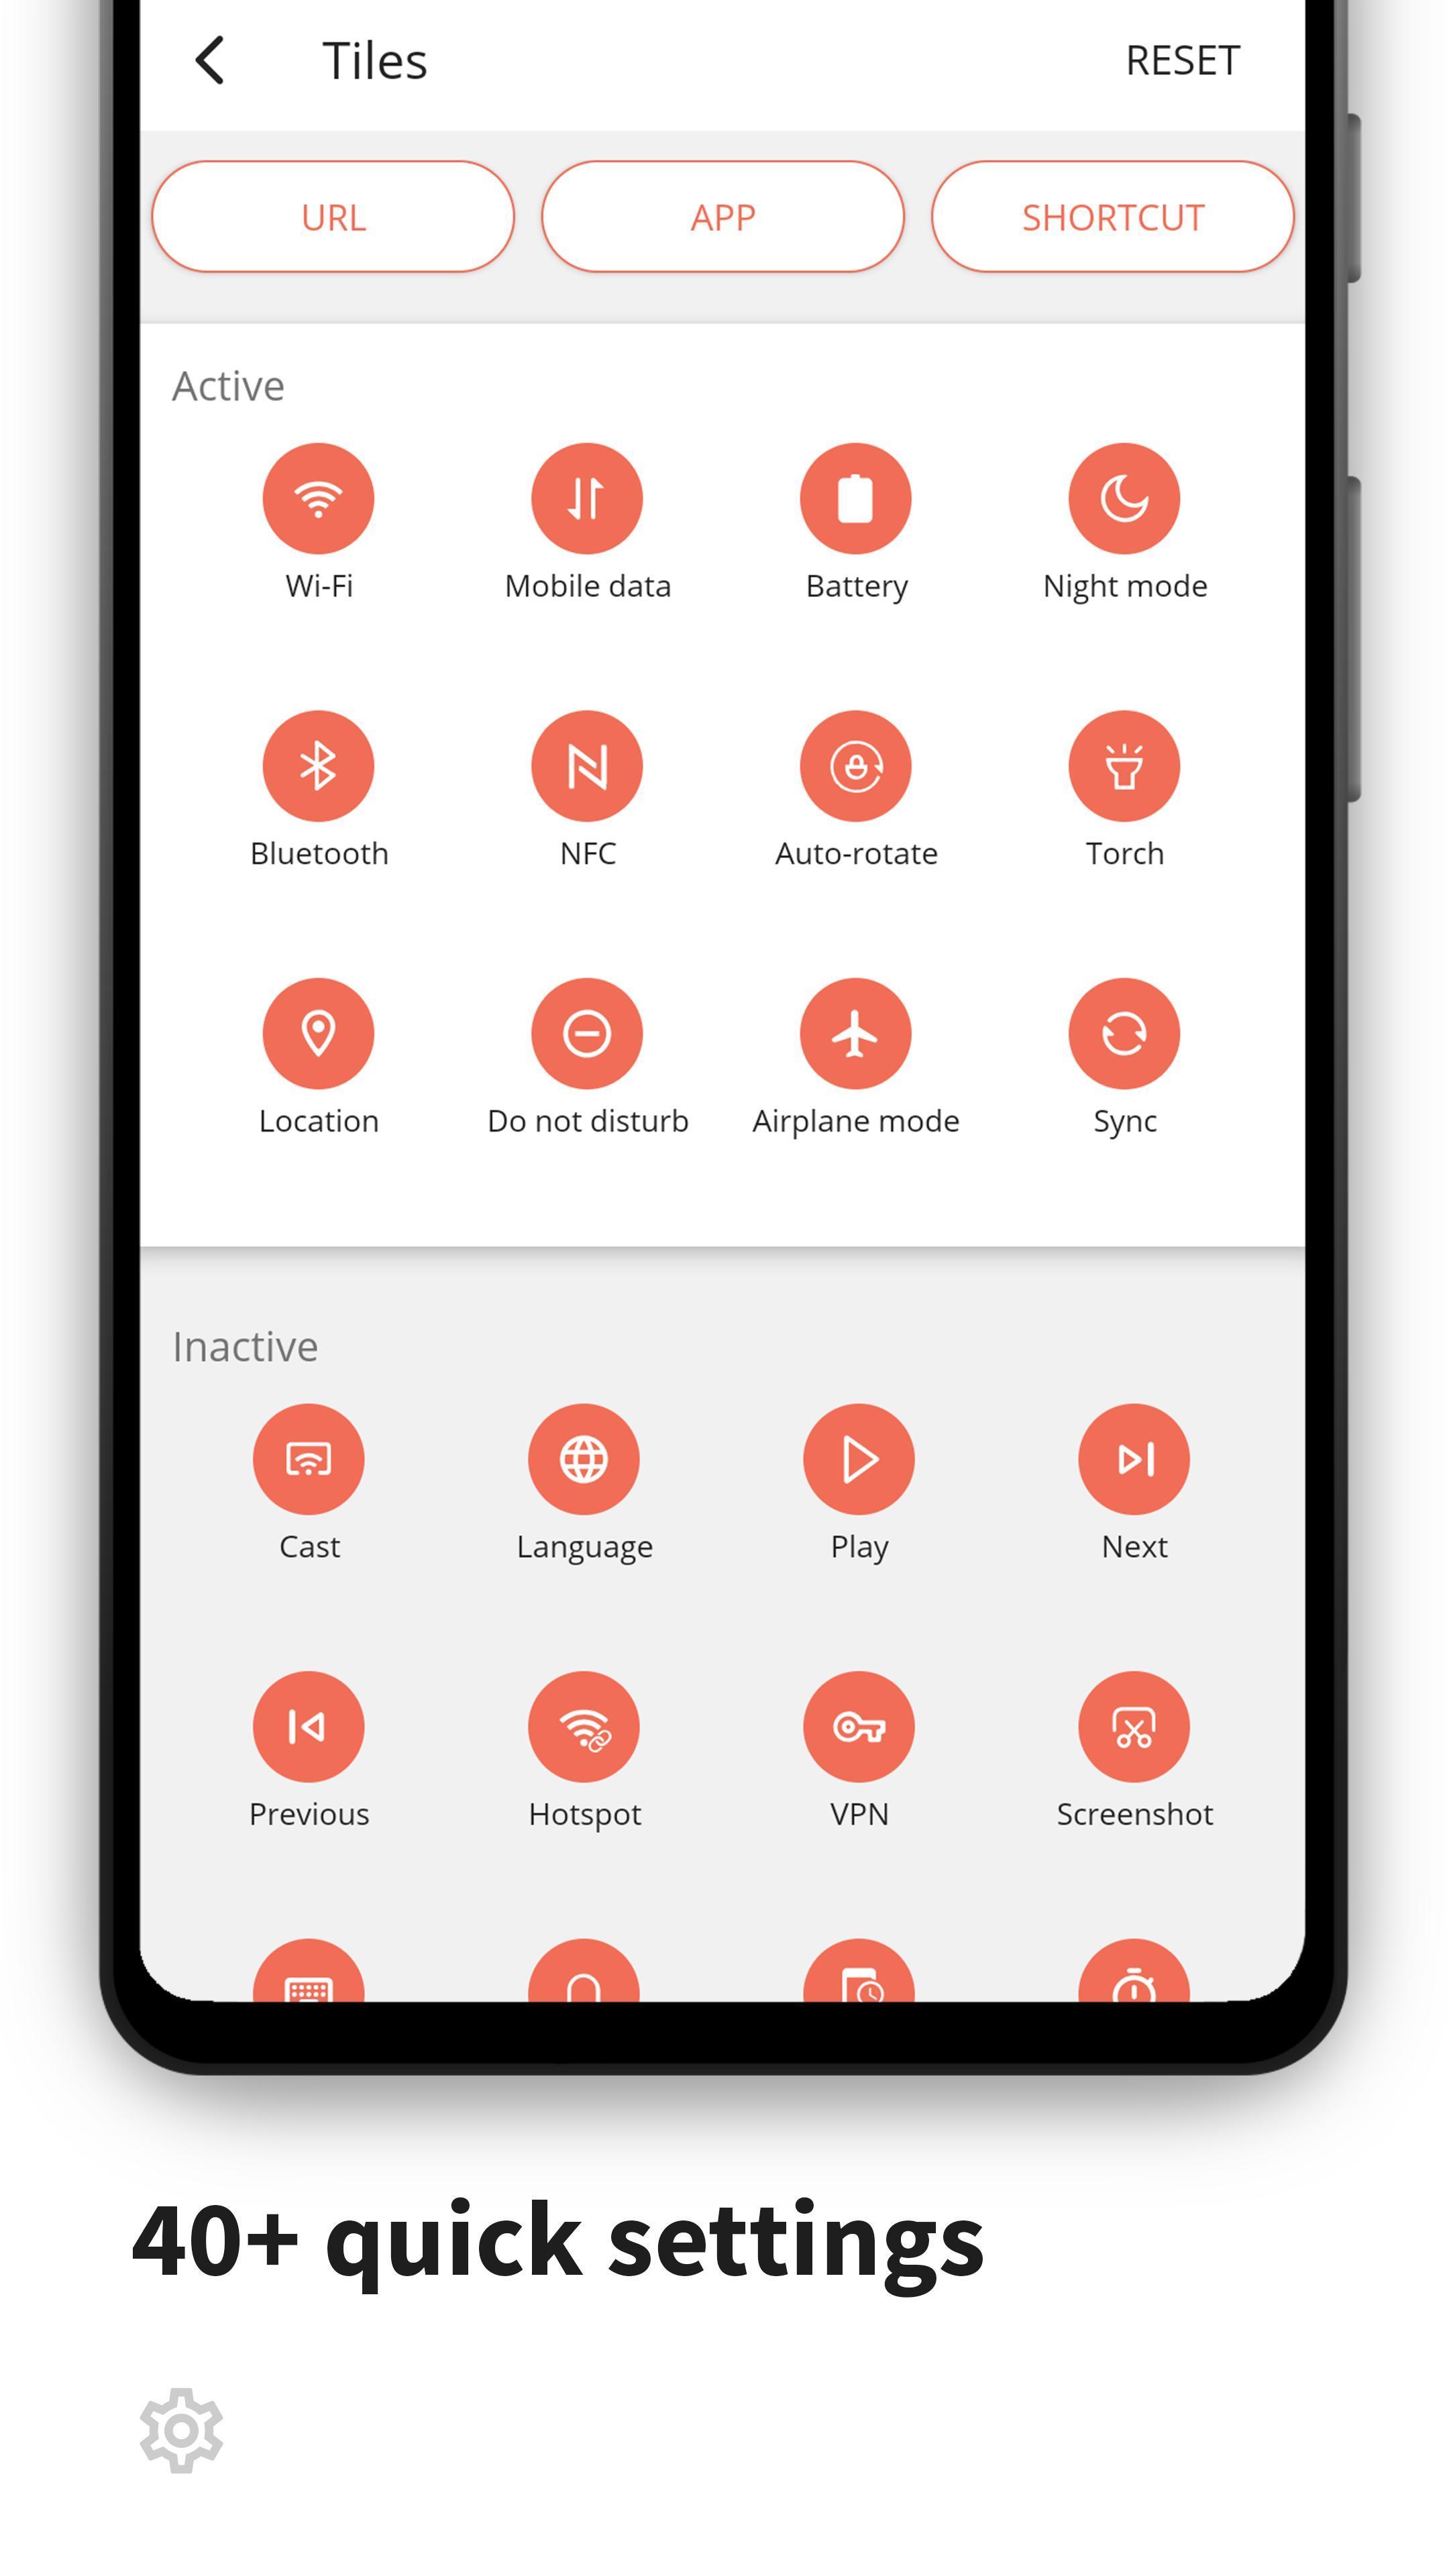 MIUI-ify Notification Shade & Quick Settings 1.7.0 Screenshot 5